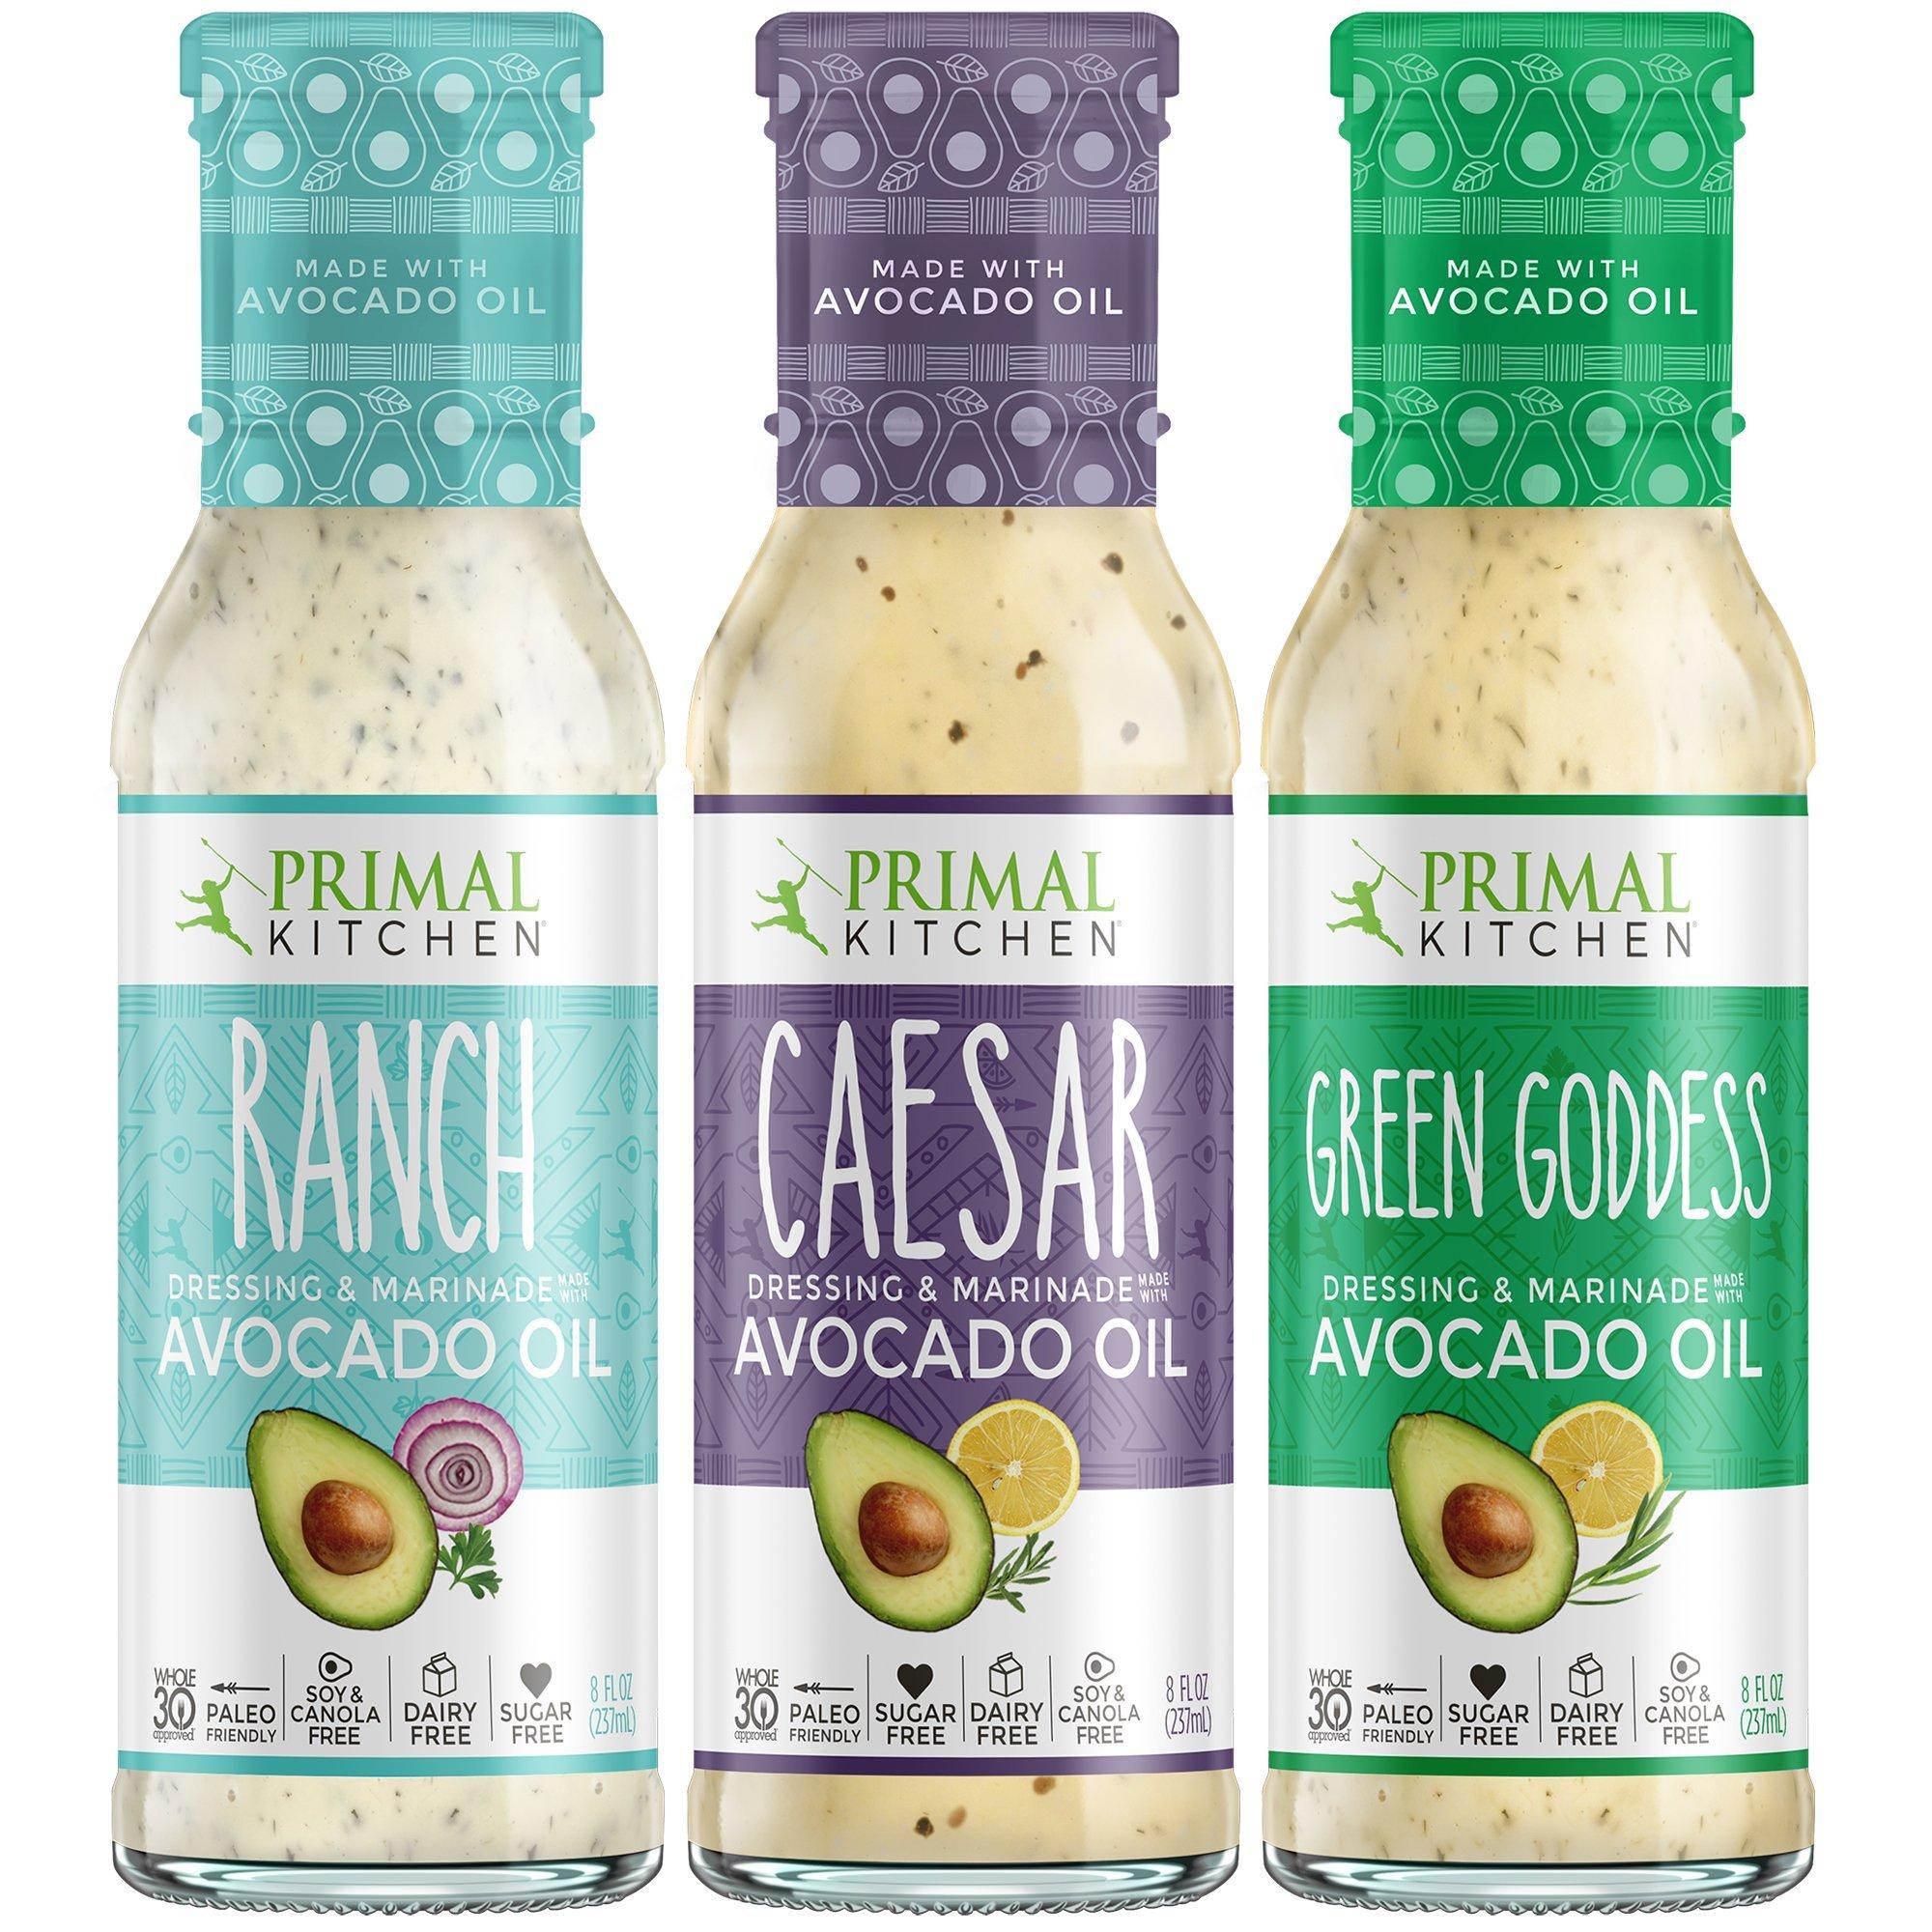 Primal Kitchen Whole 30 Avocado Oil Dressing & Marinade (Ranch, Caesar, Green Goddess) - 3 Pack